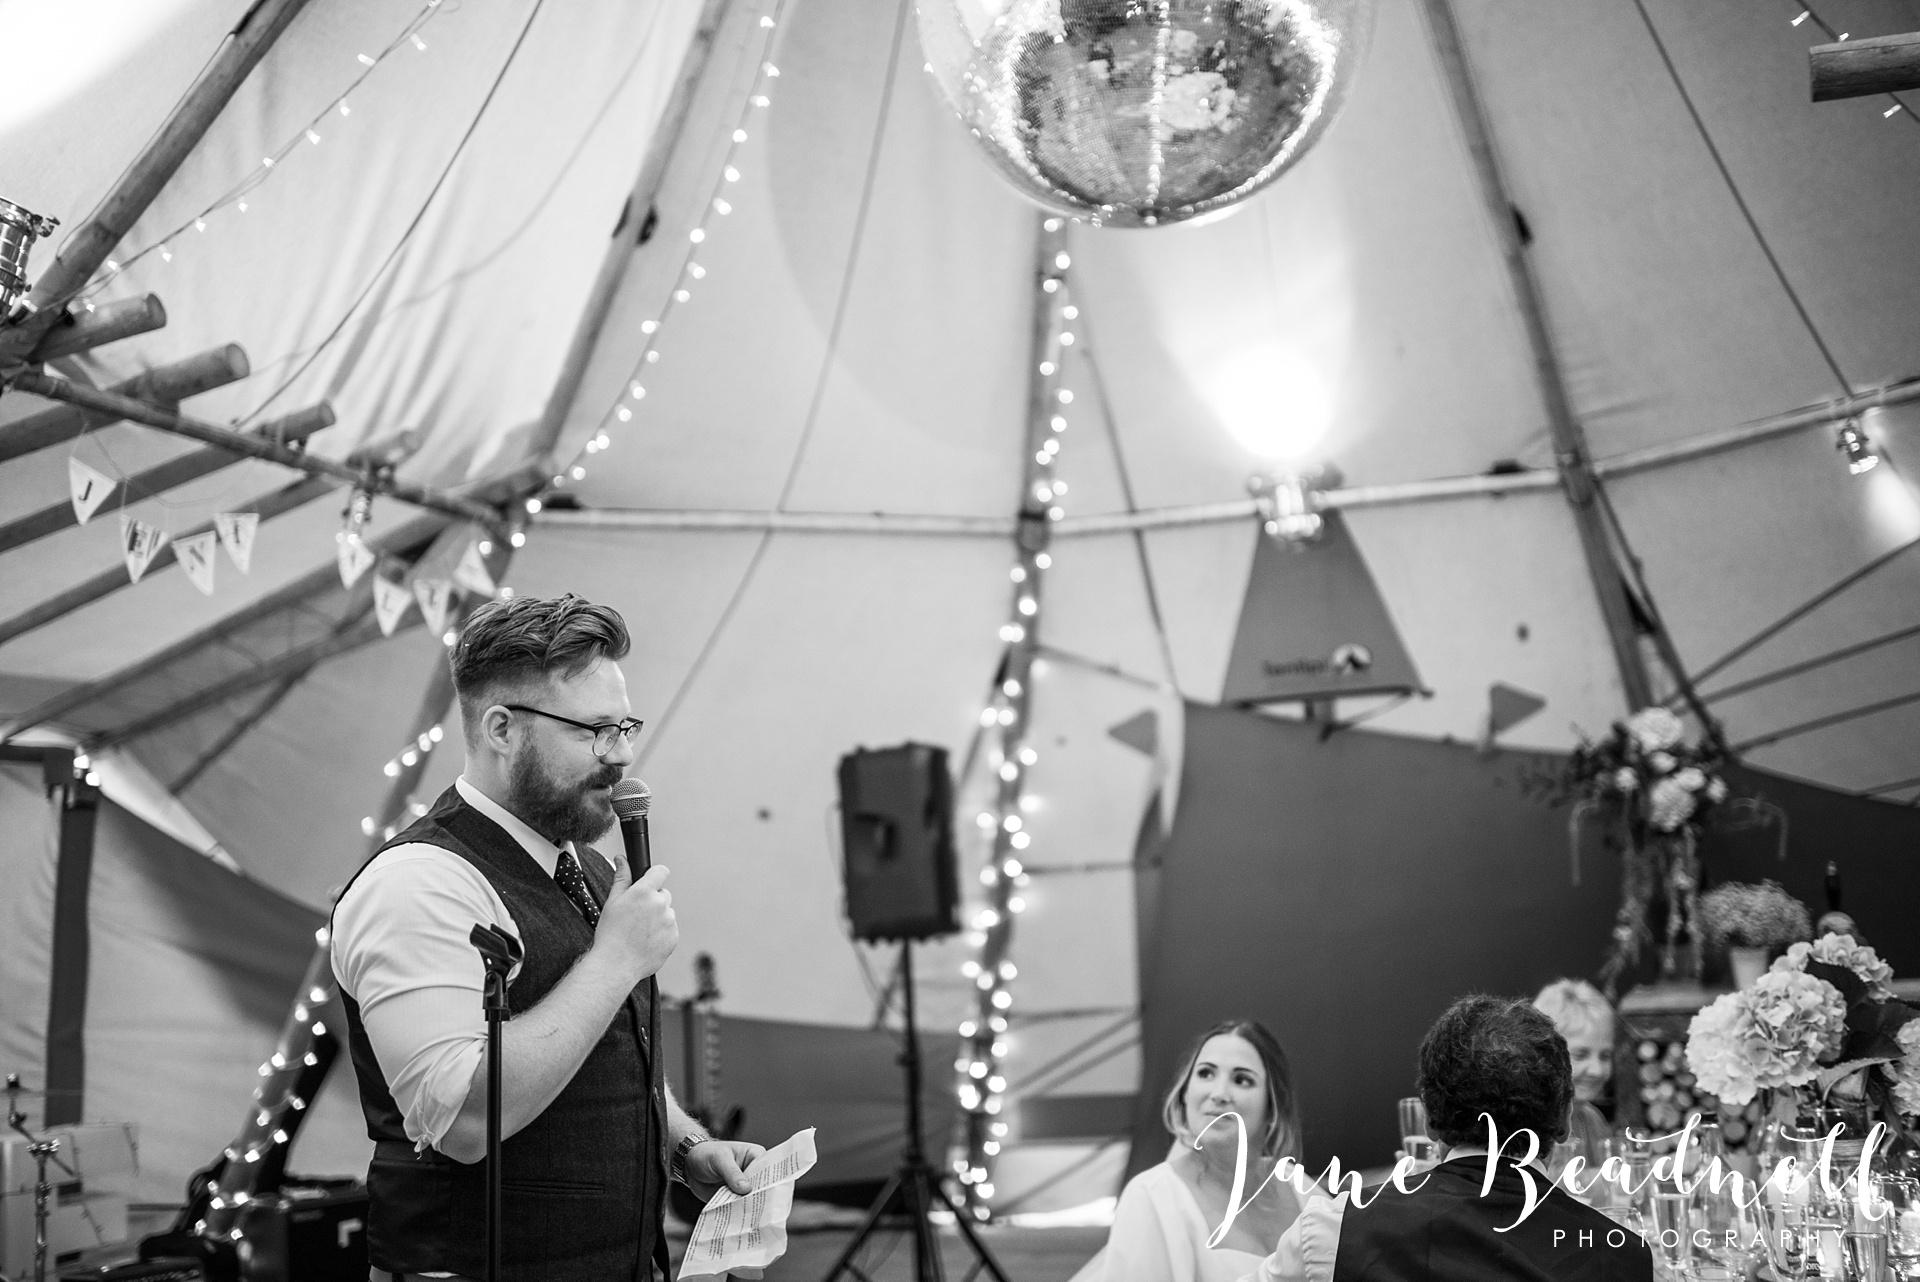 fine-art-wedding-photographer-jane-beadnell-yorkshire-wedding-photographer_0139